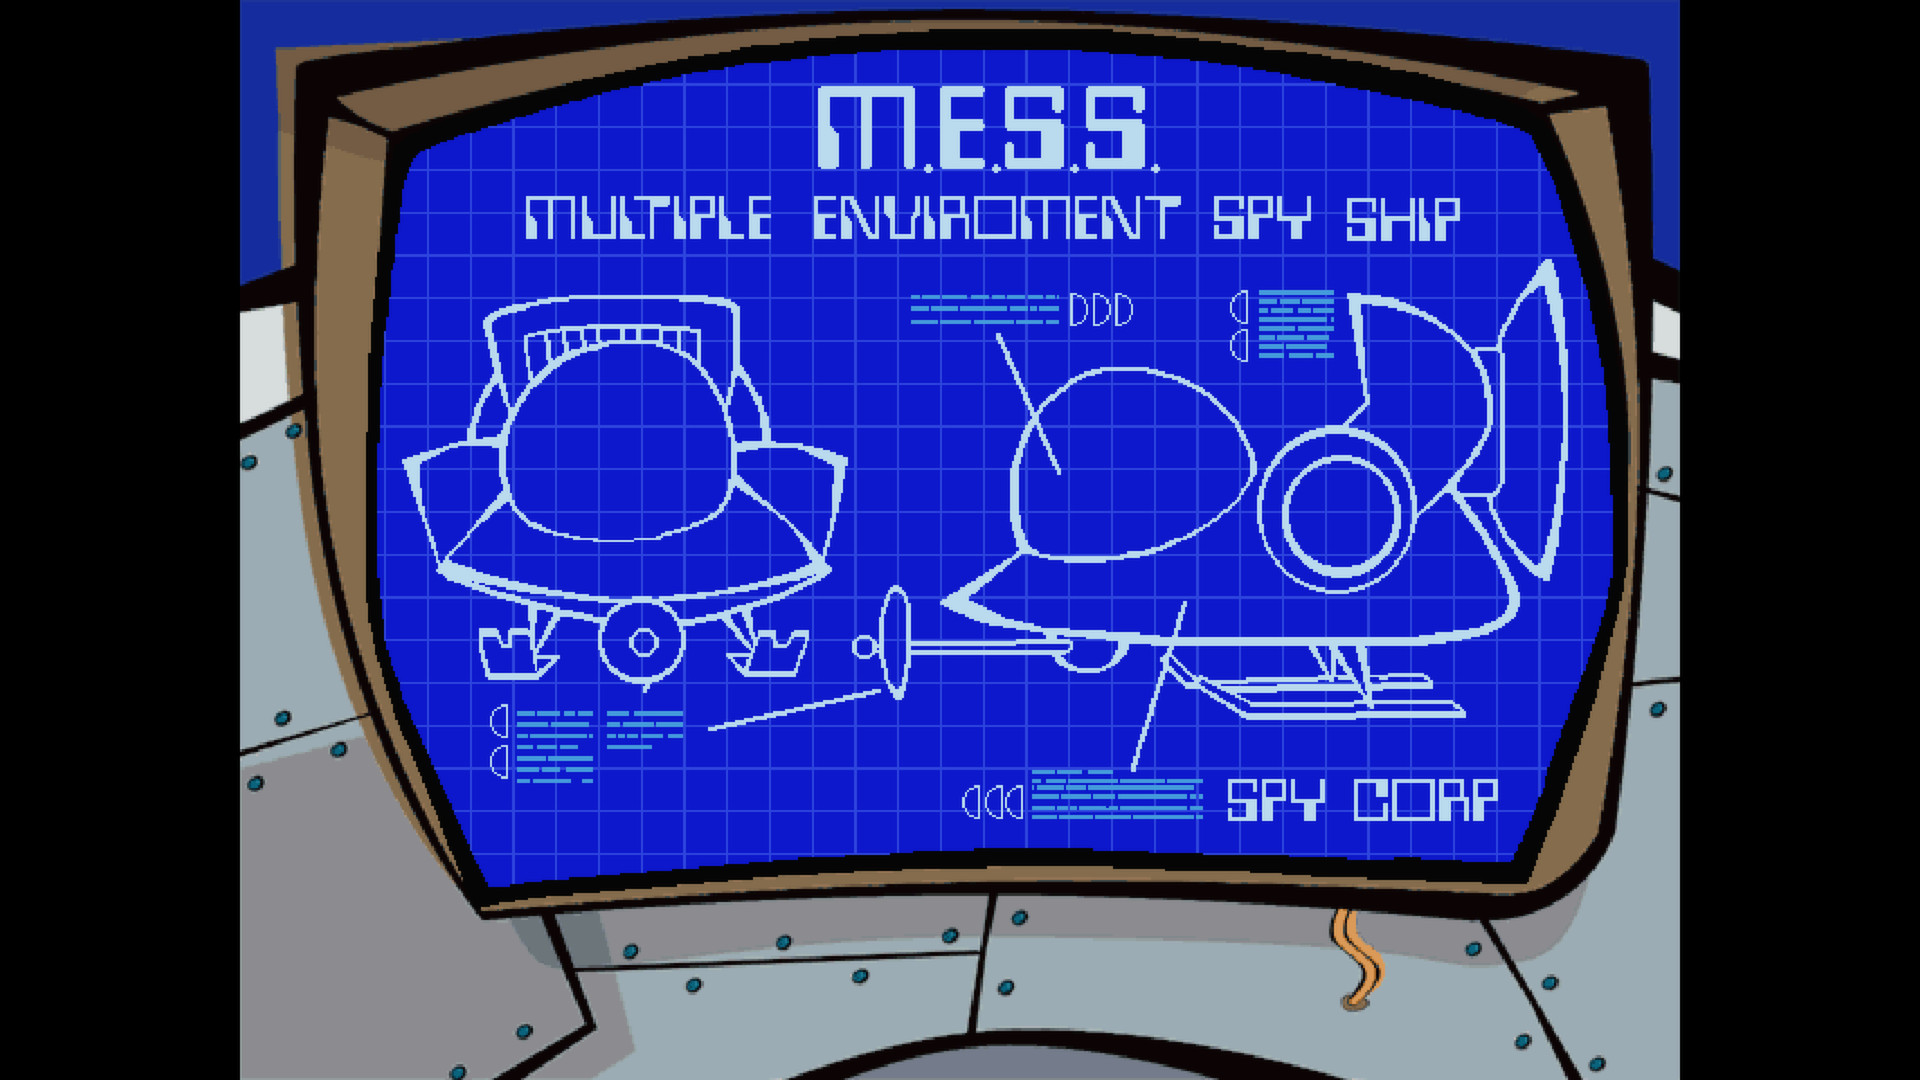 Spy Fox In: Hold the Mustard screenshot